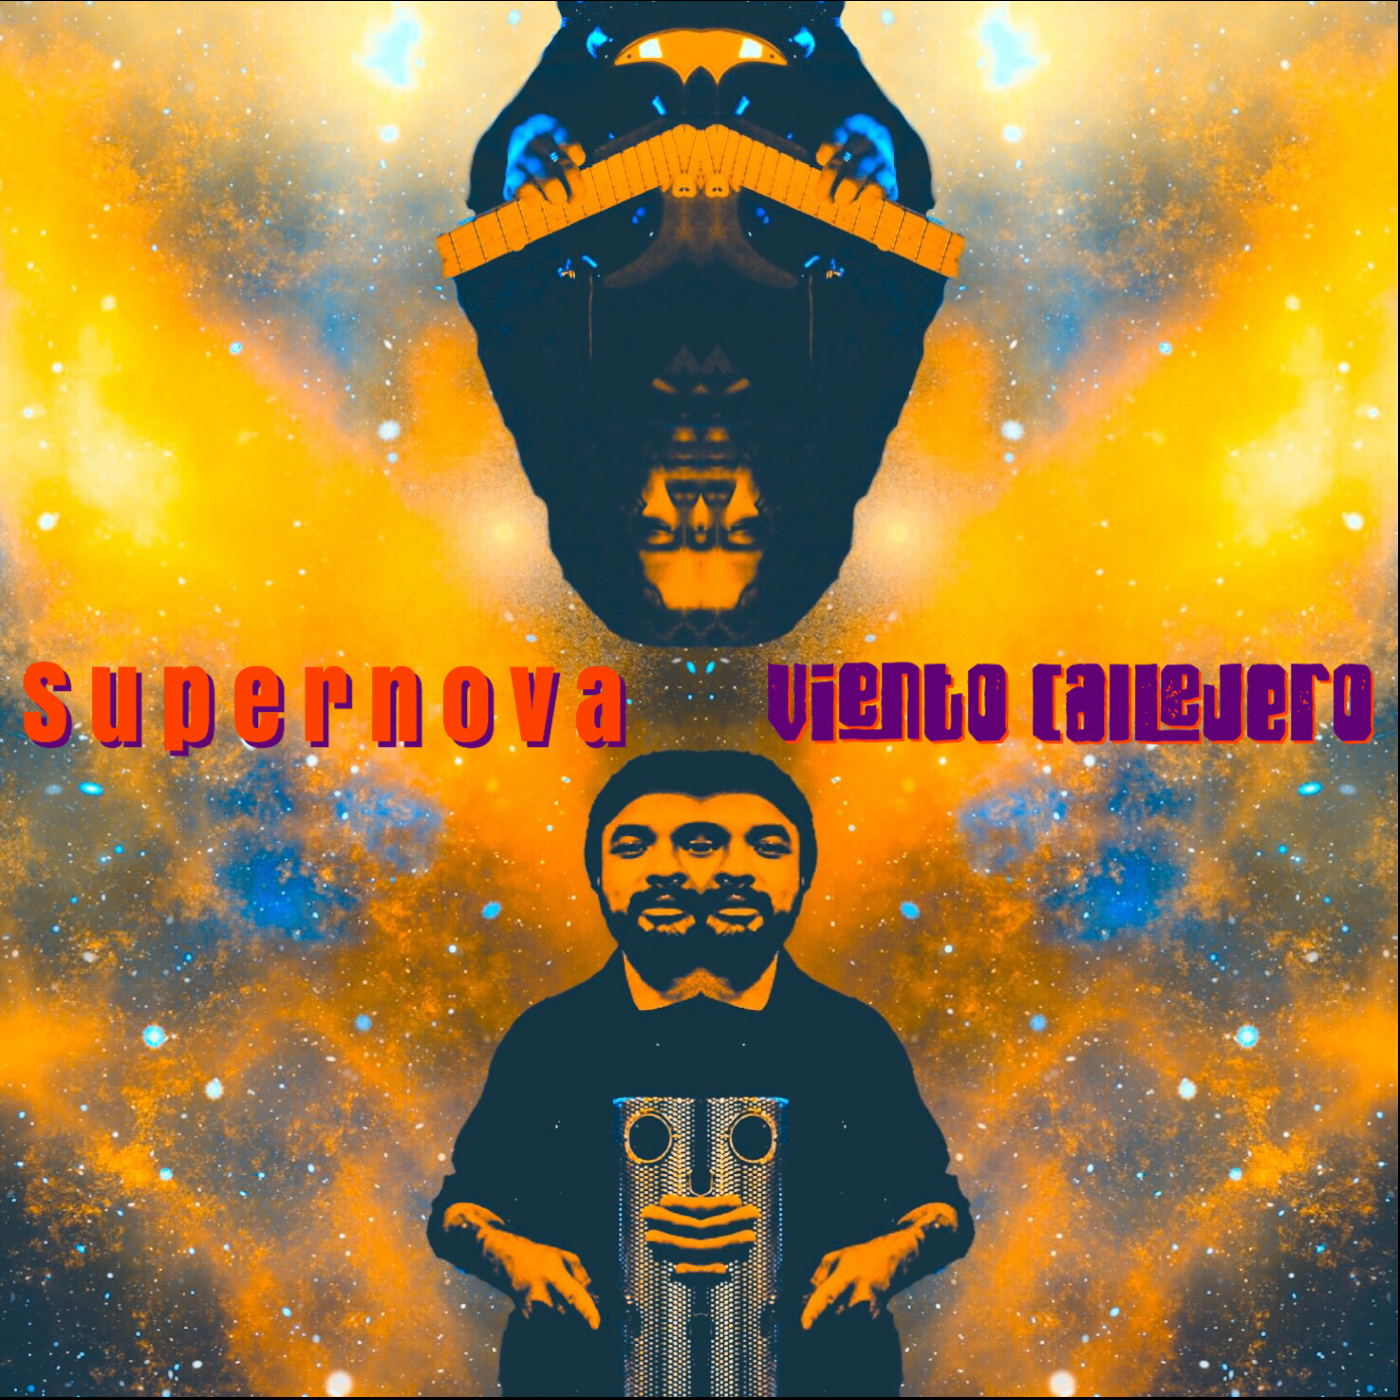 Supernova 1400.jpg